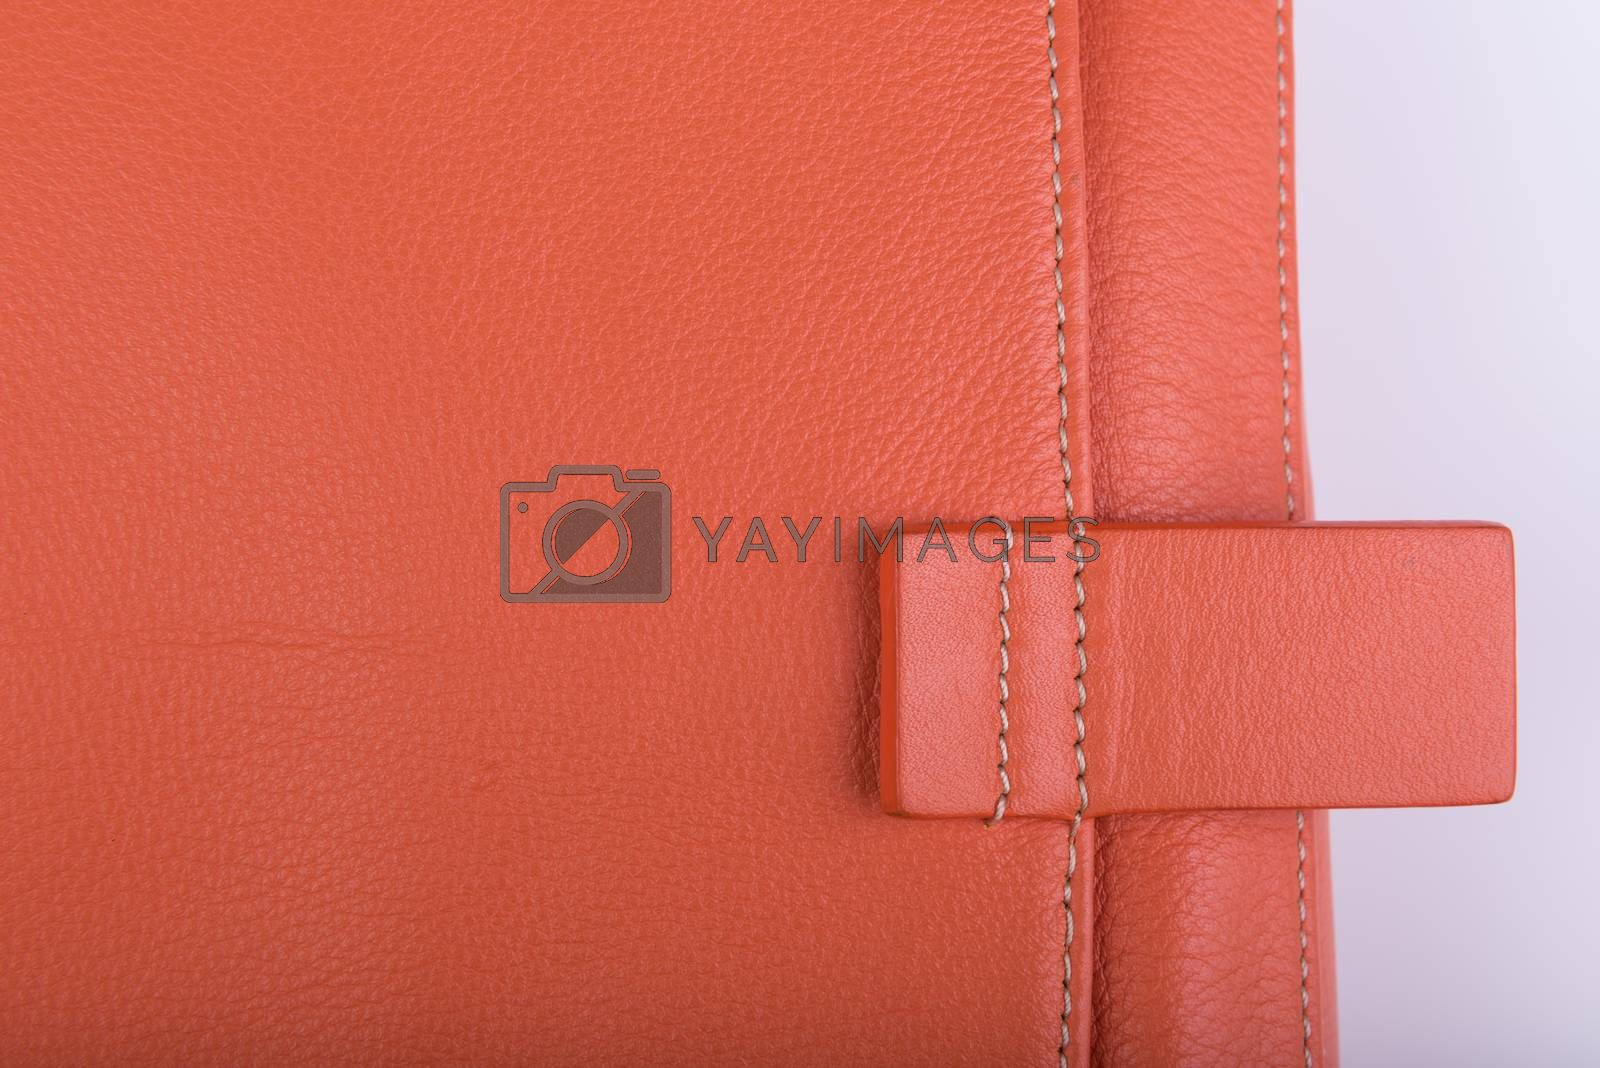 Close up orange leather bag